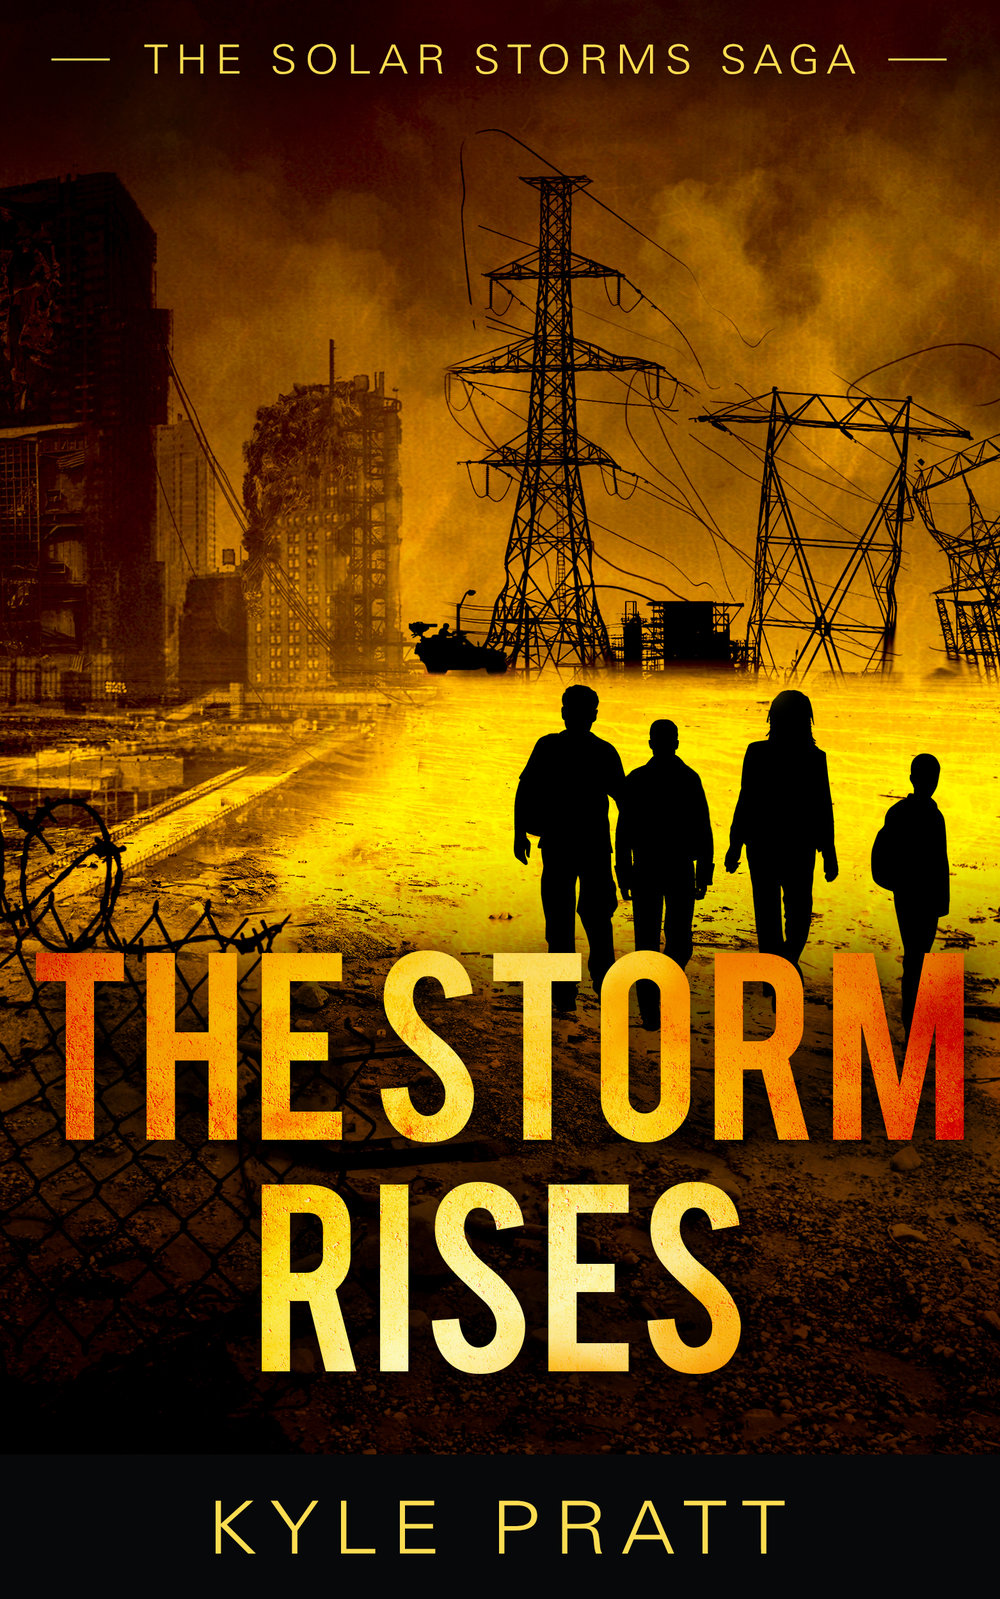 THE STORM RISES_ebook cover.jpg